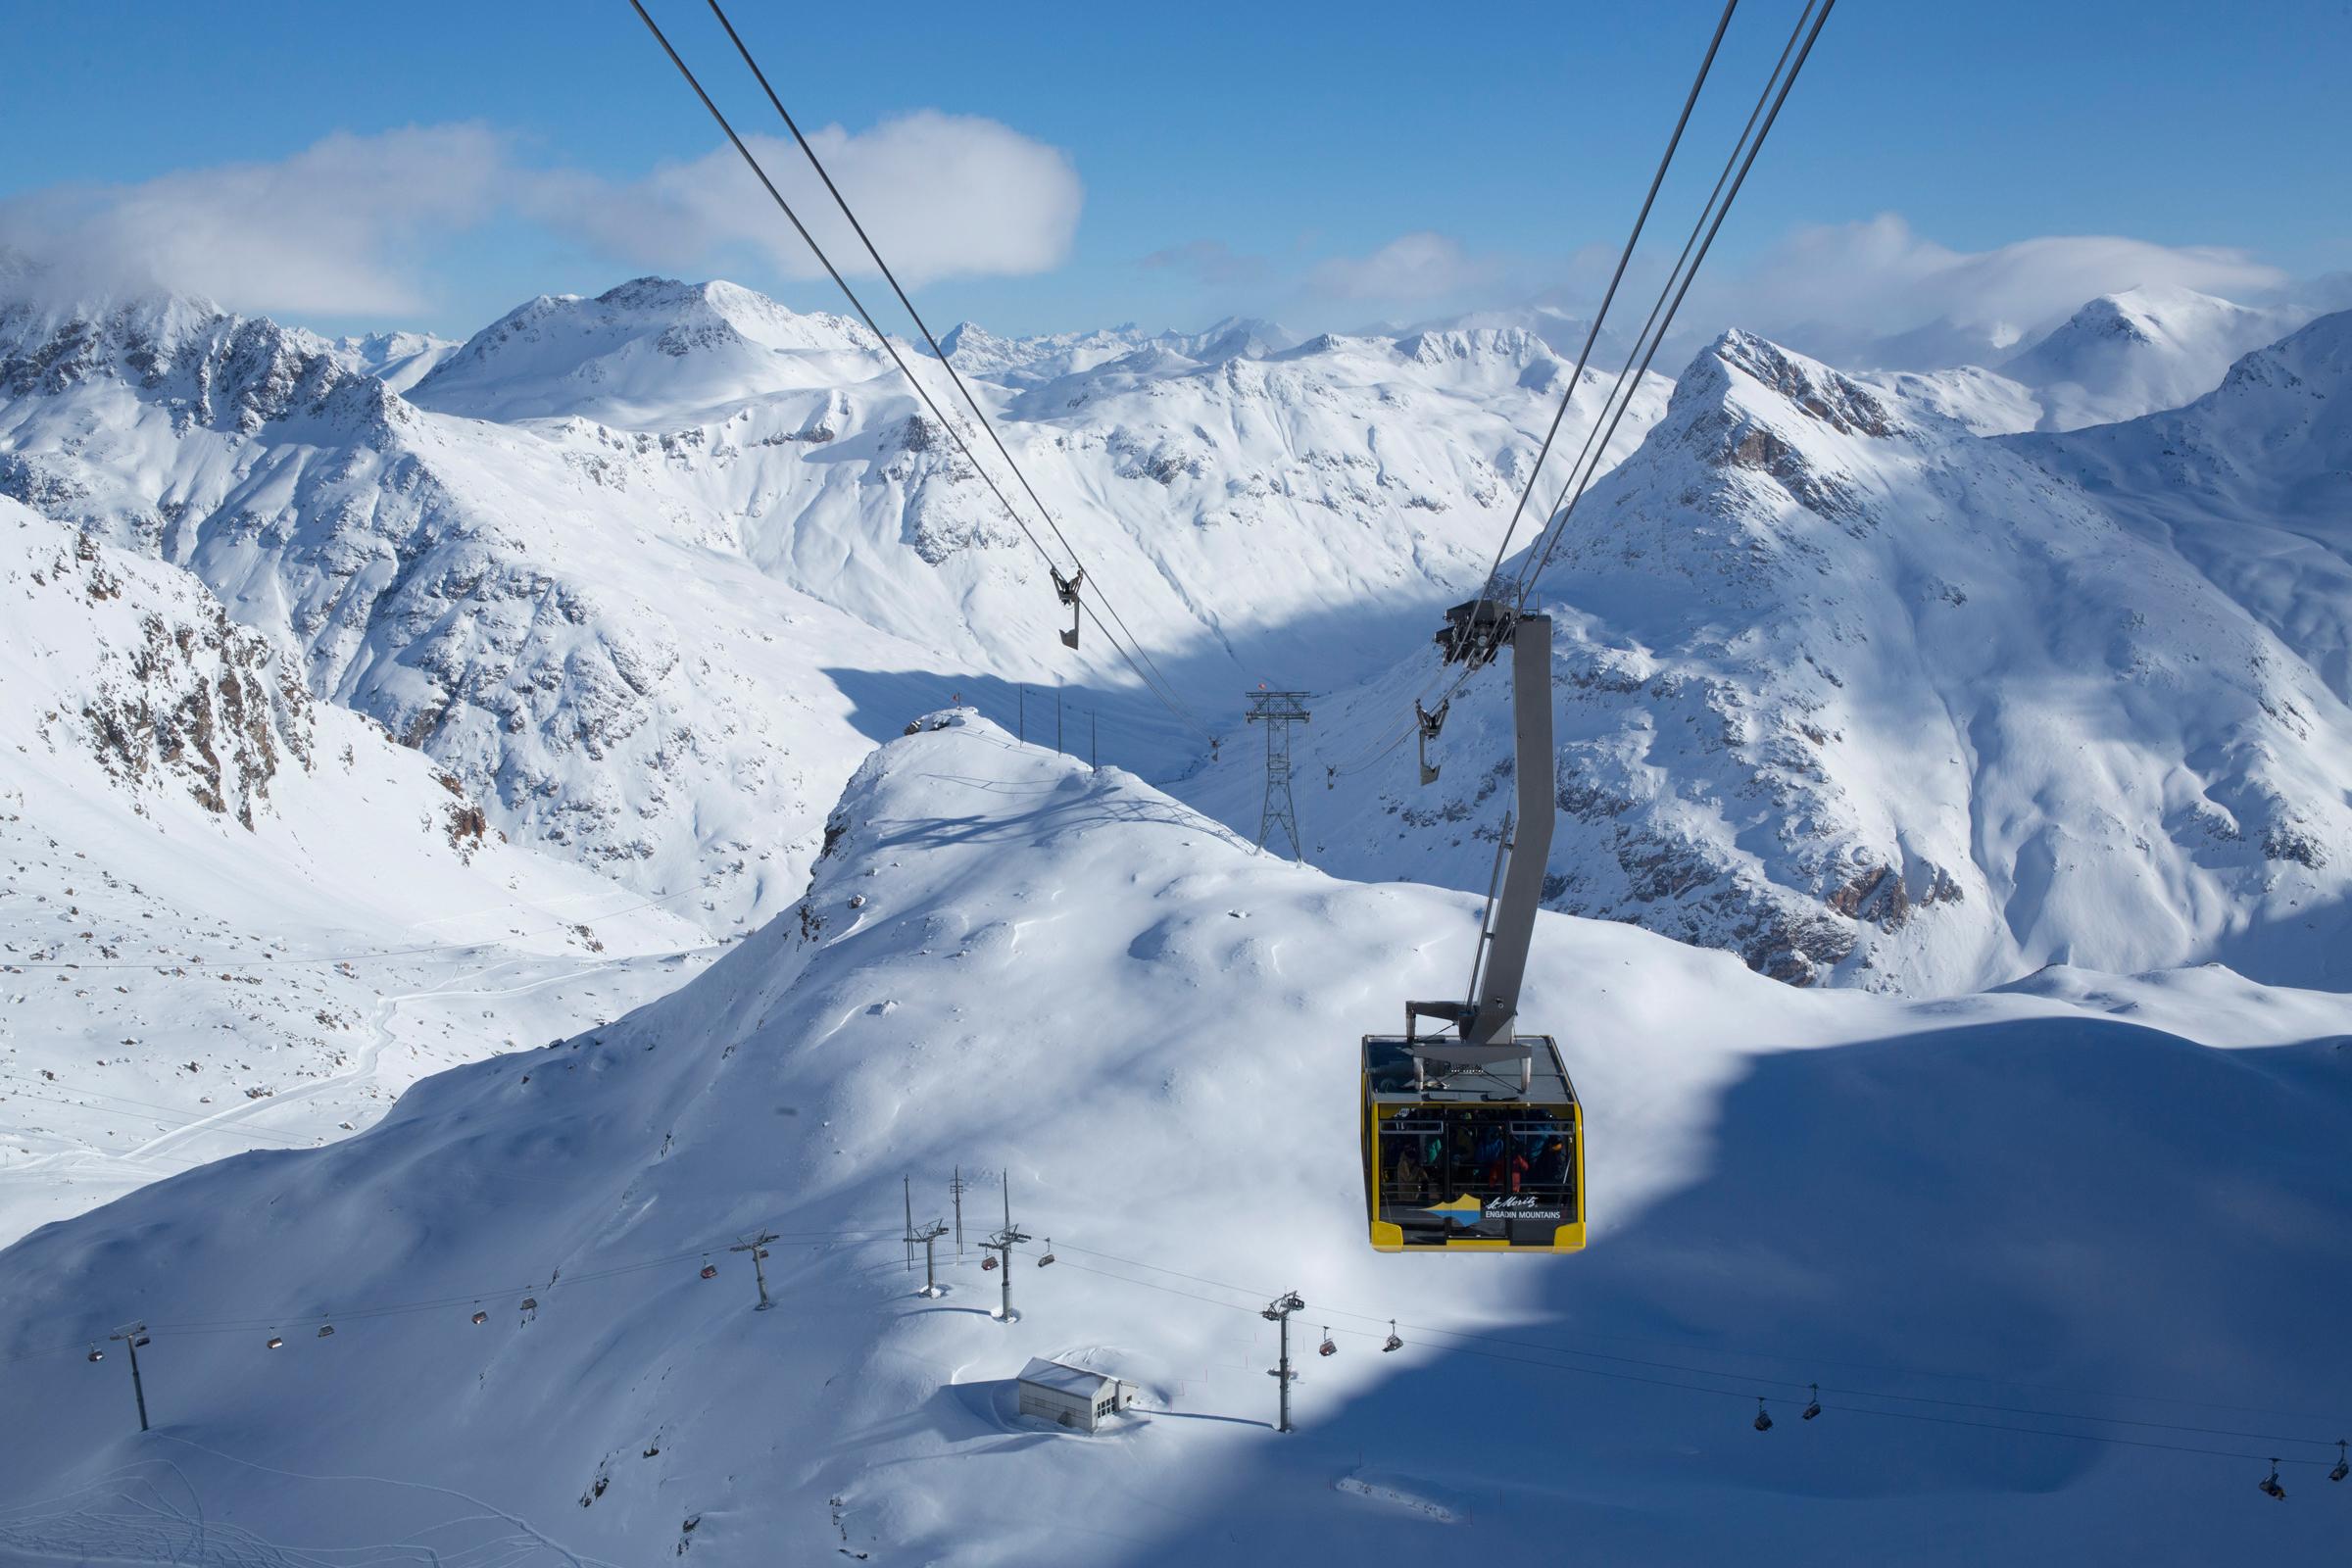 Schneesportregion Diavolezza